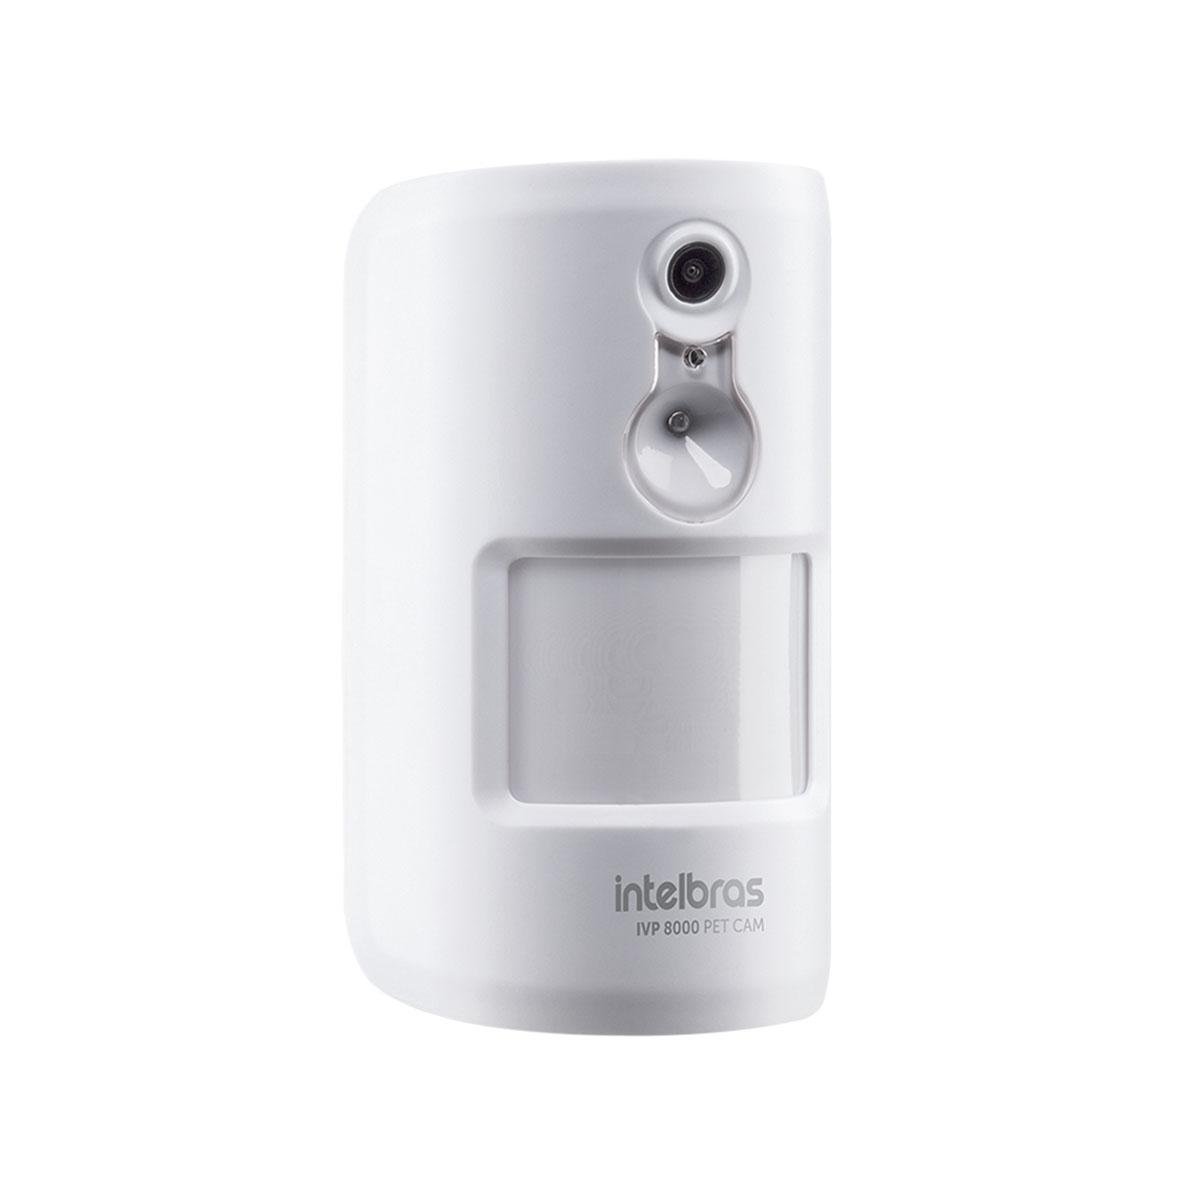 Kit 10 Sensor Passivo Sem Fio Intelbras Ivp 8000 Pet Cam